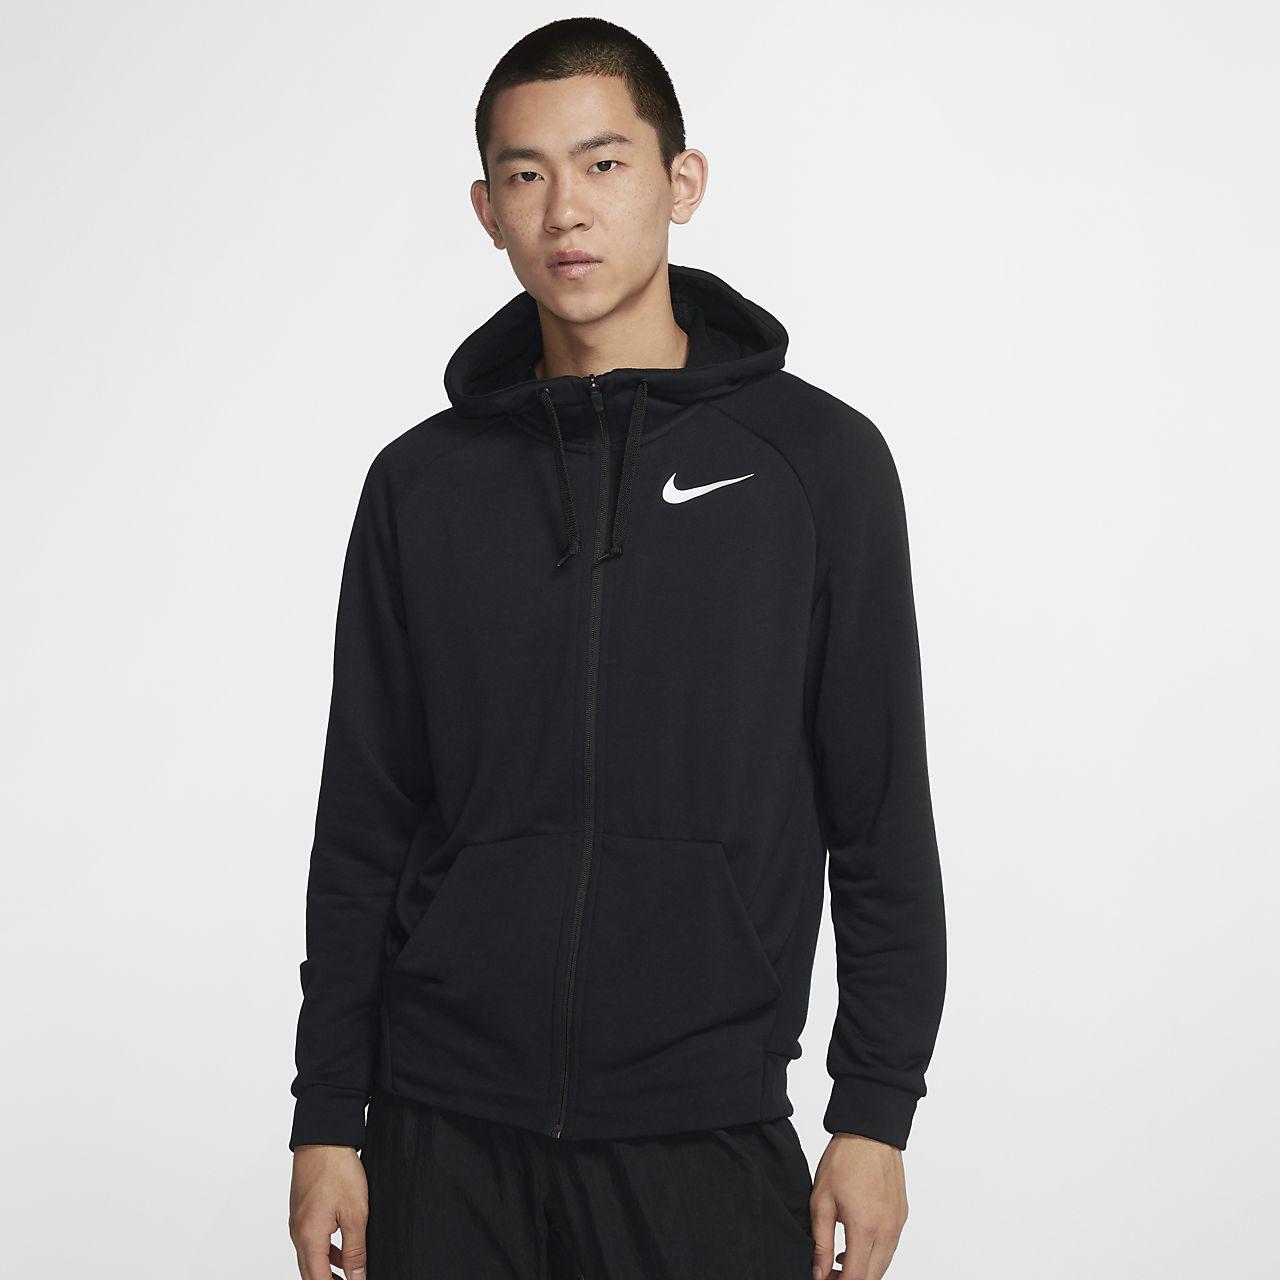 Nike Dri-FIT 男子连帽针织训练上衣